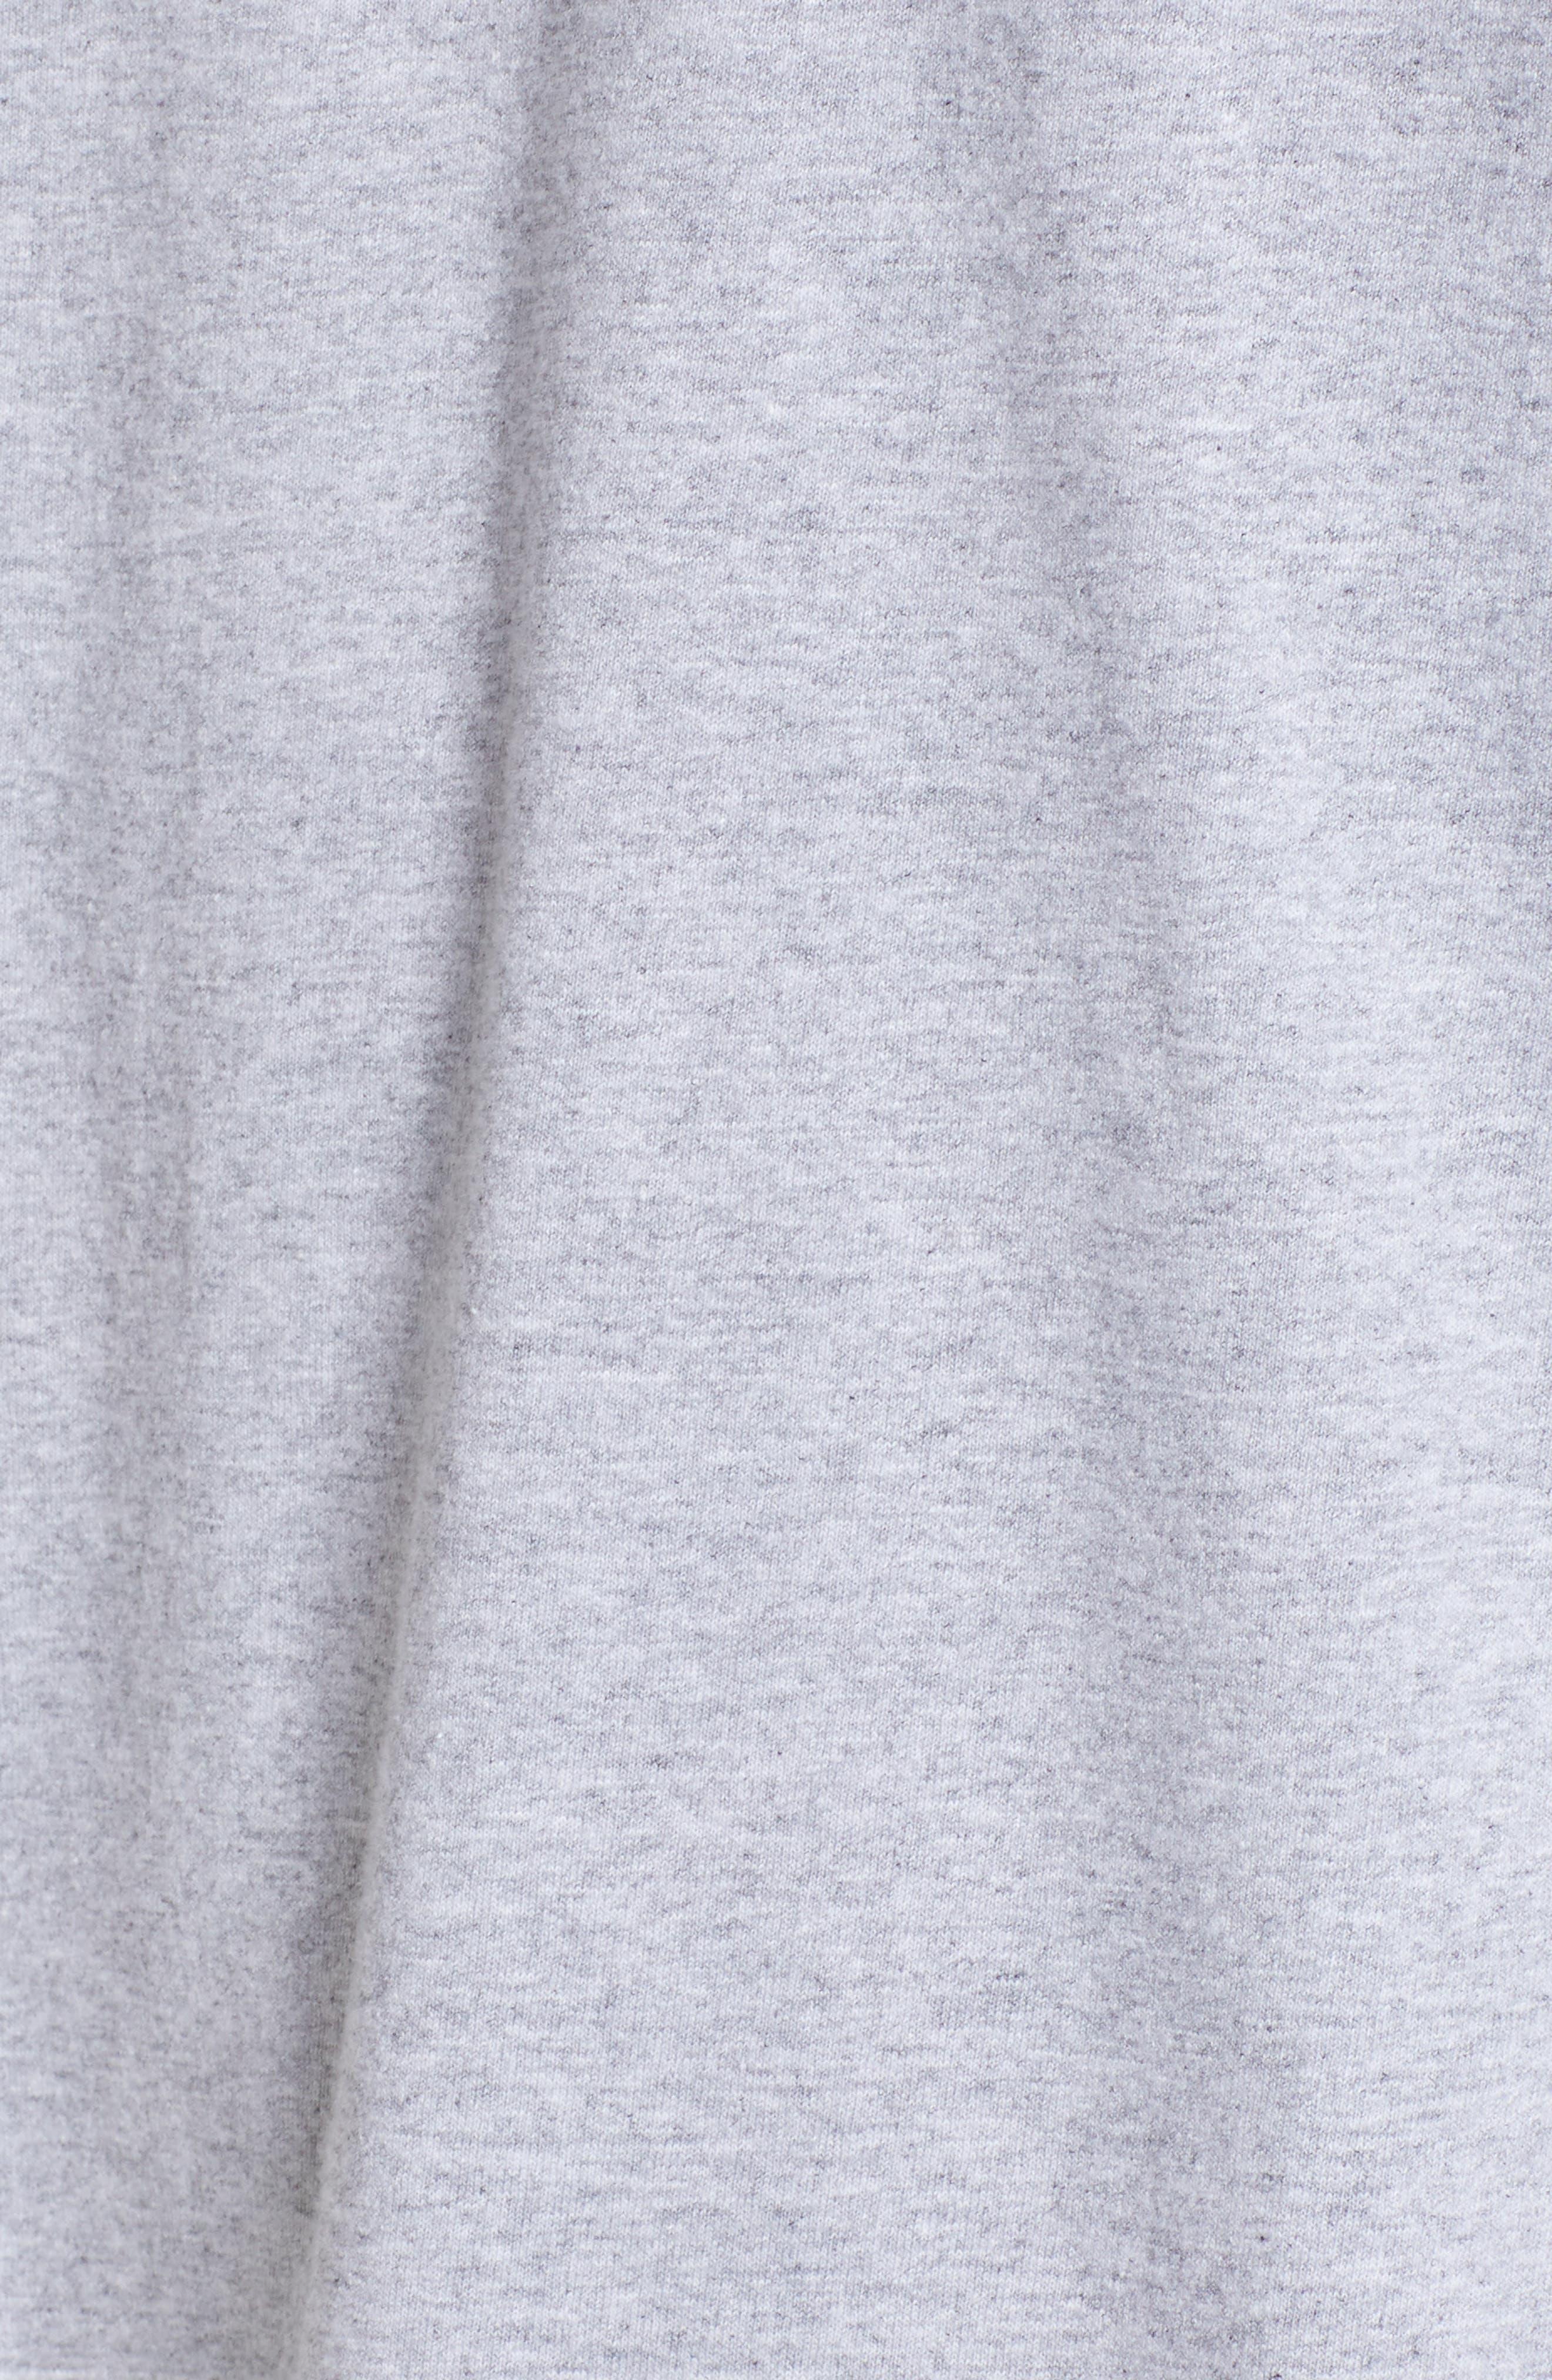 Established '66 Graphic T-Shirt,                             Alternate thumbnail 5, color,                             Grey